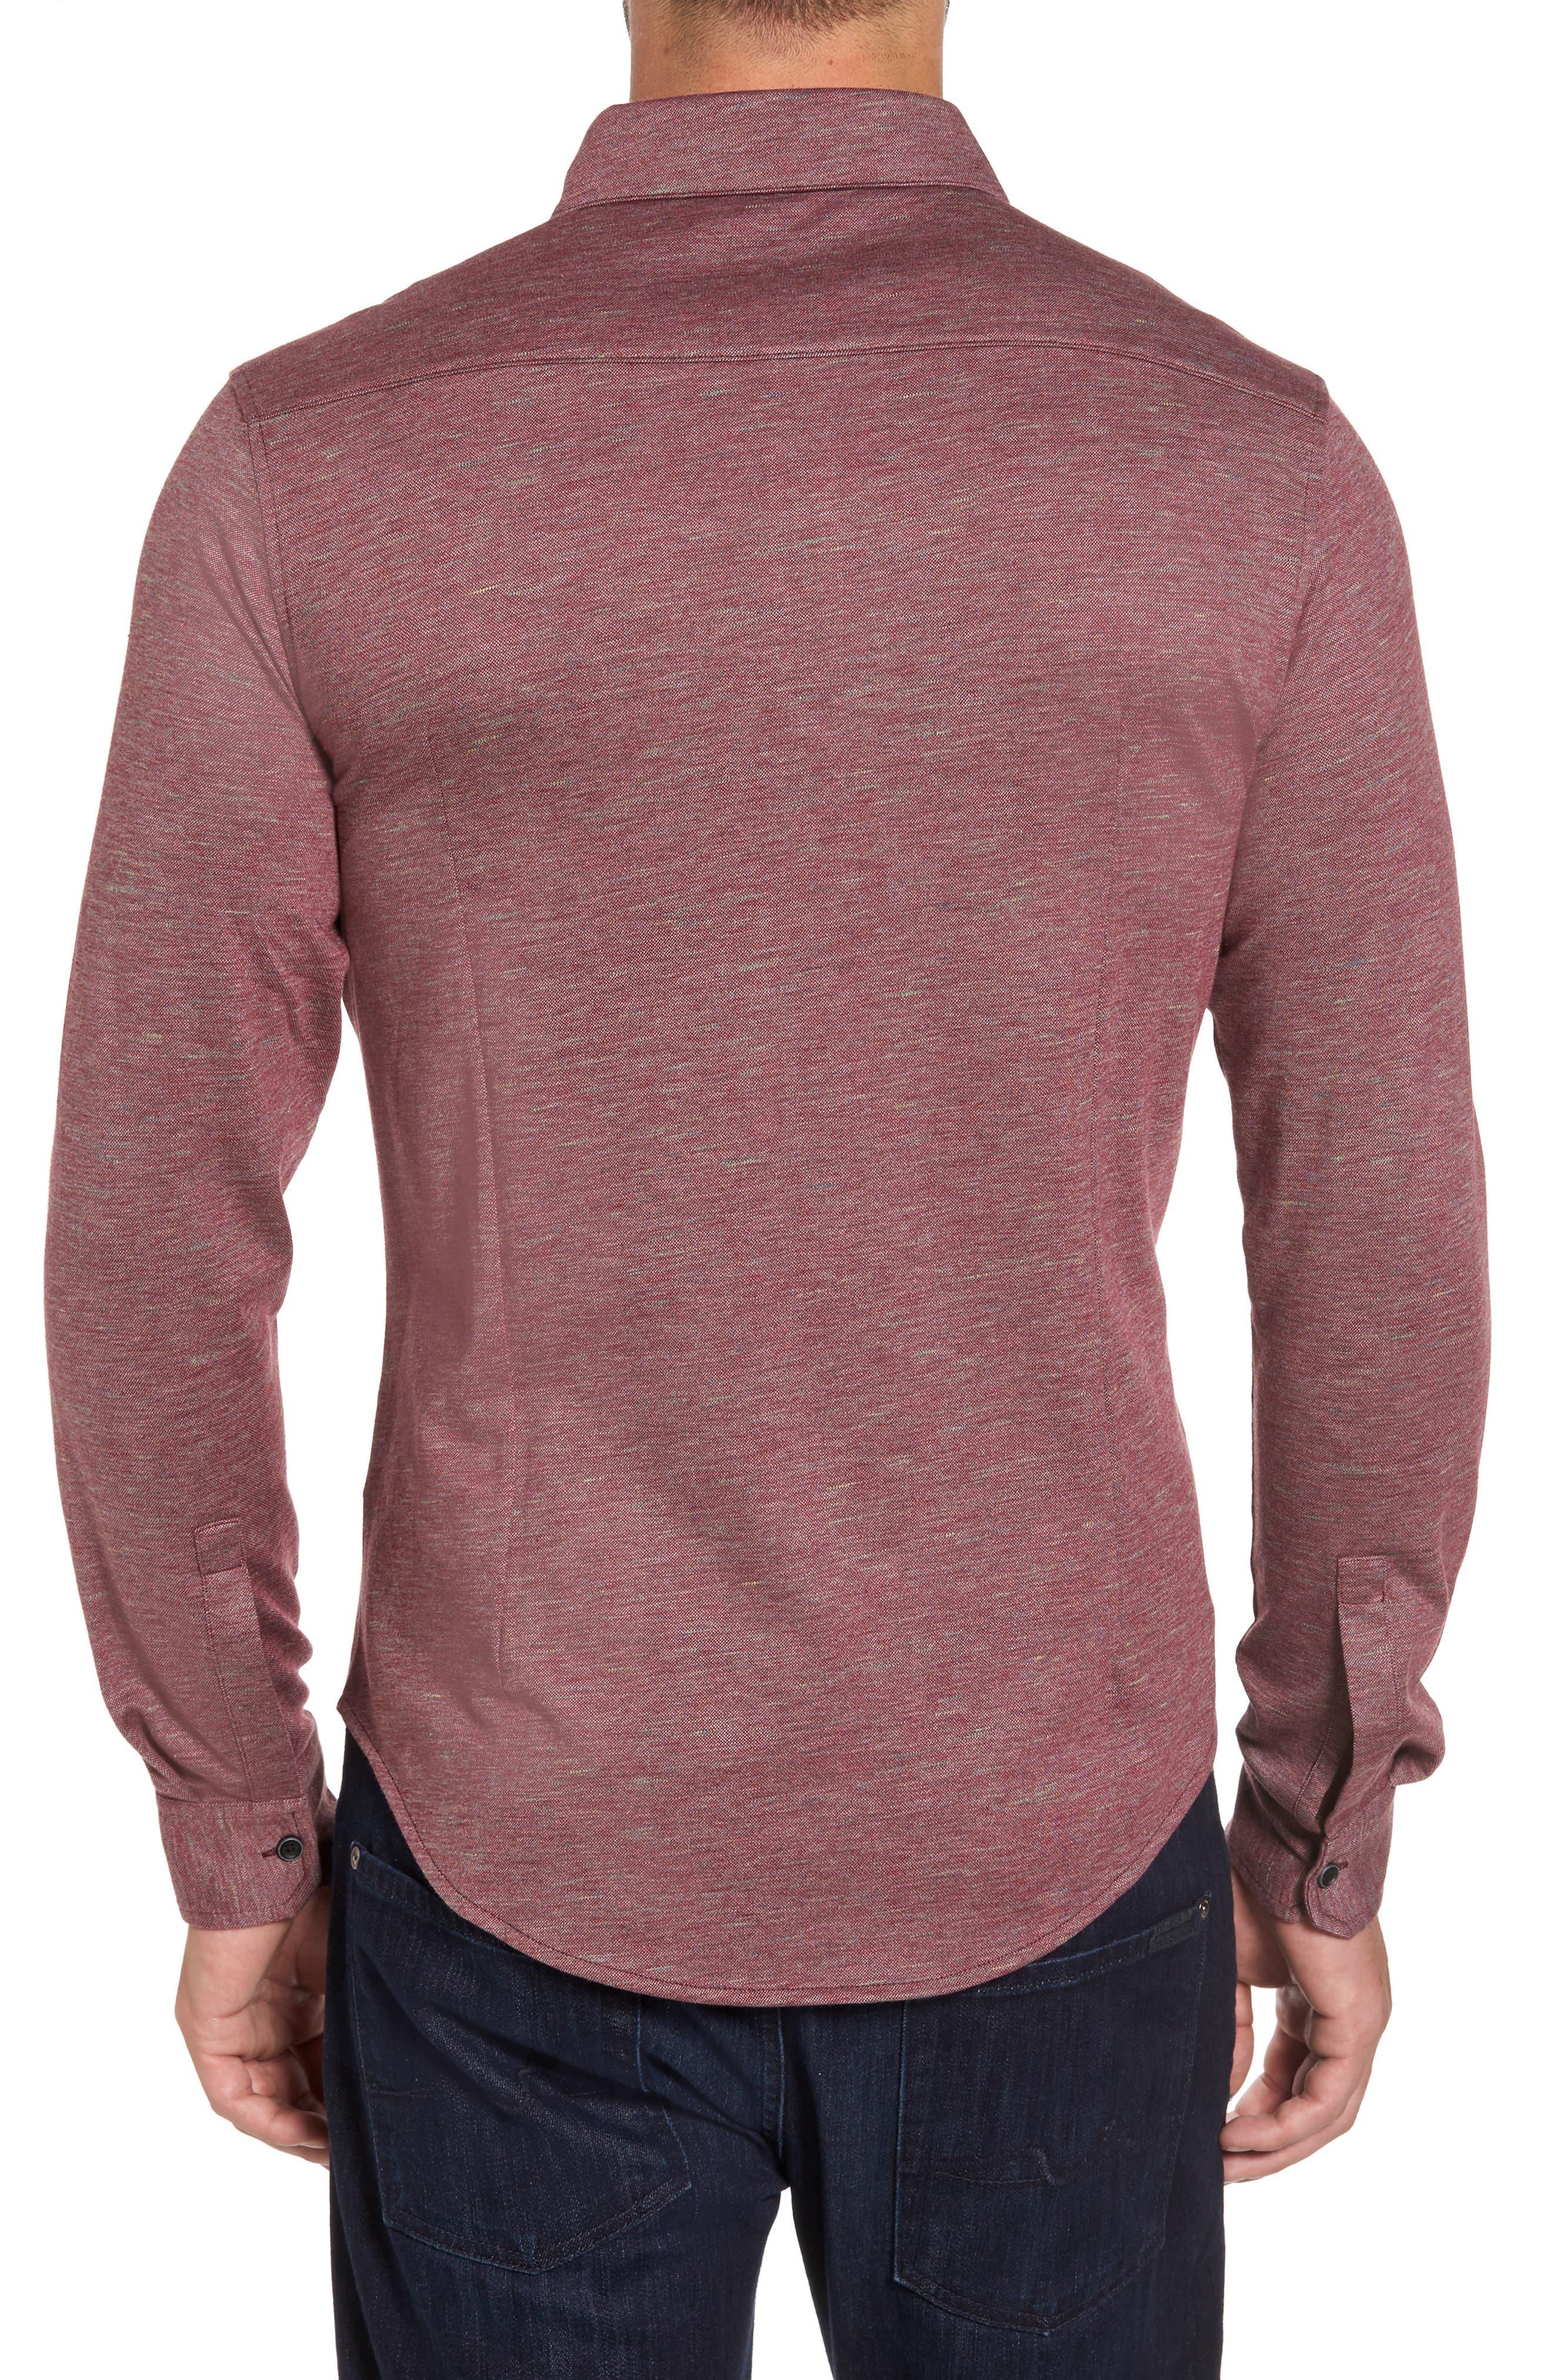 Alternate Image 2  - Bugatchi Regular Fit Piqué Knit Sport Shirt